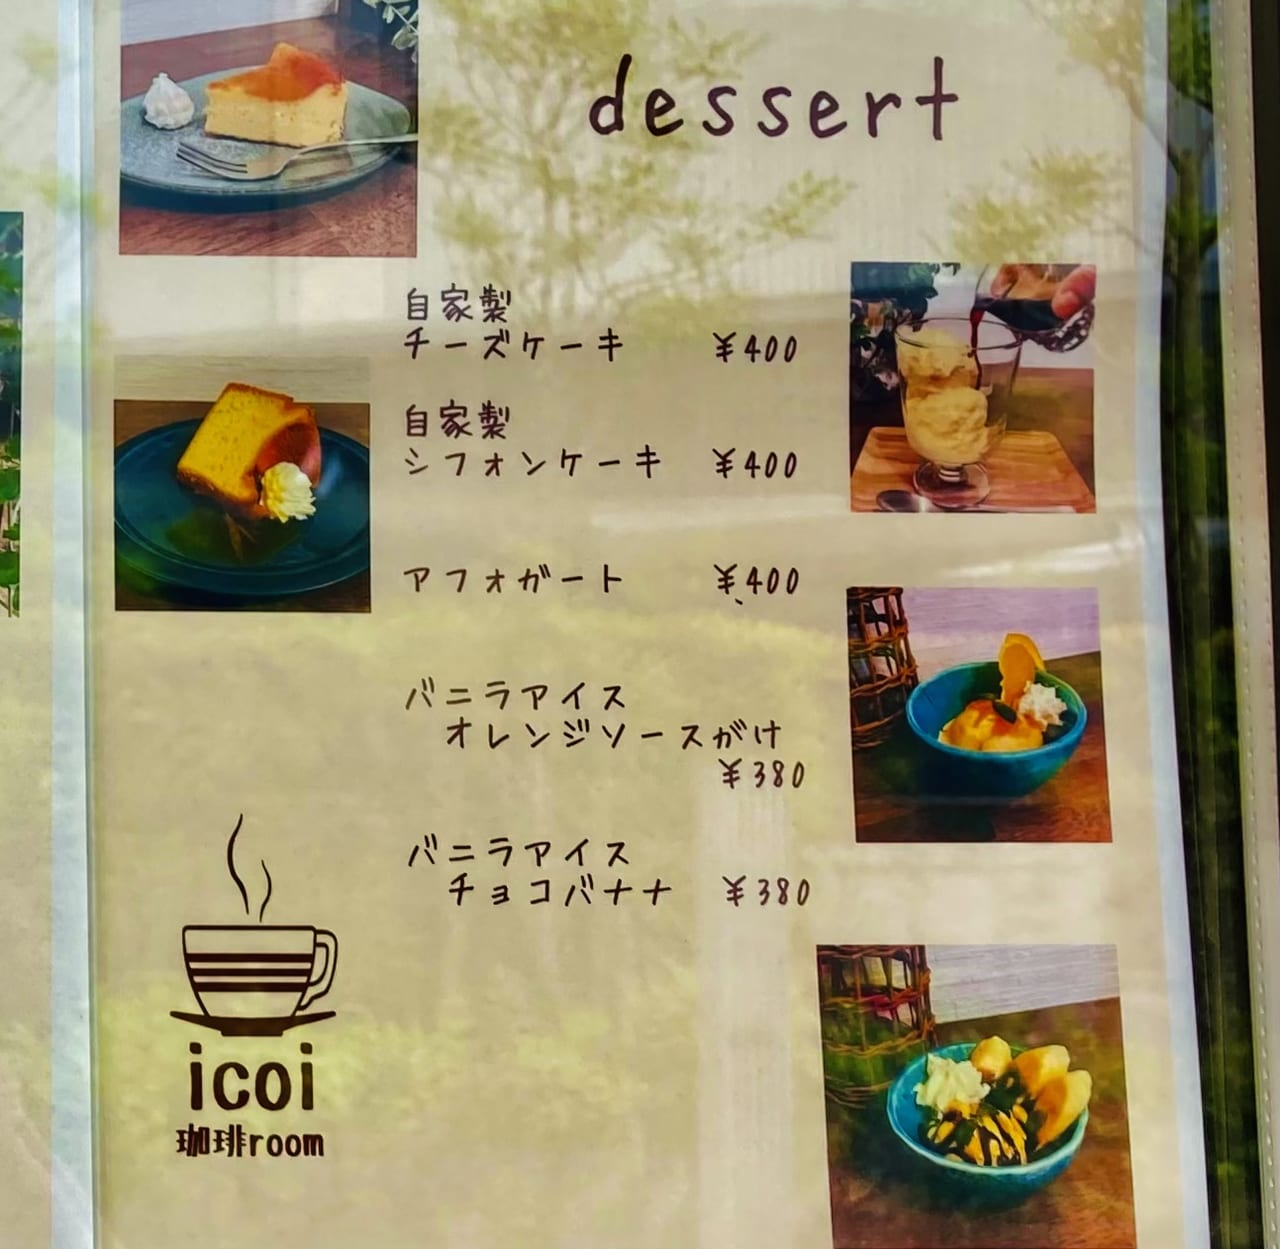 icoi sweets